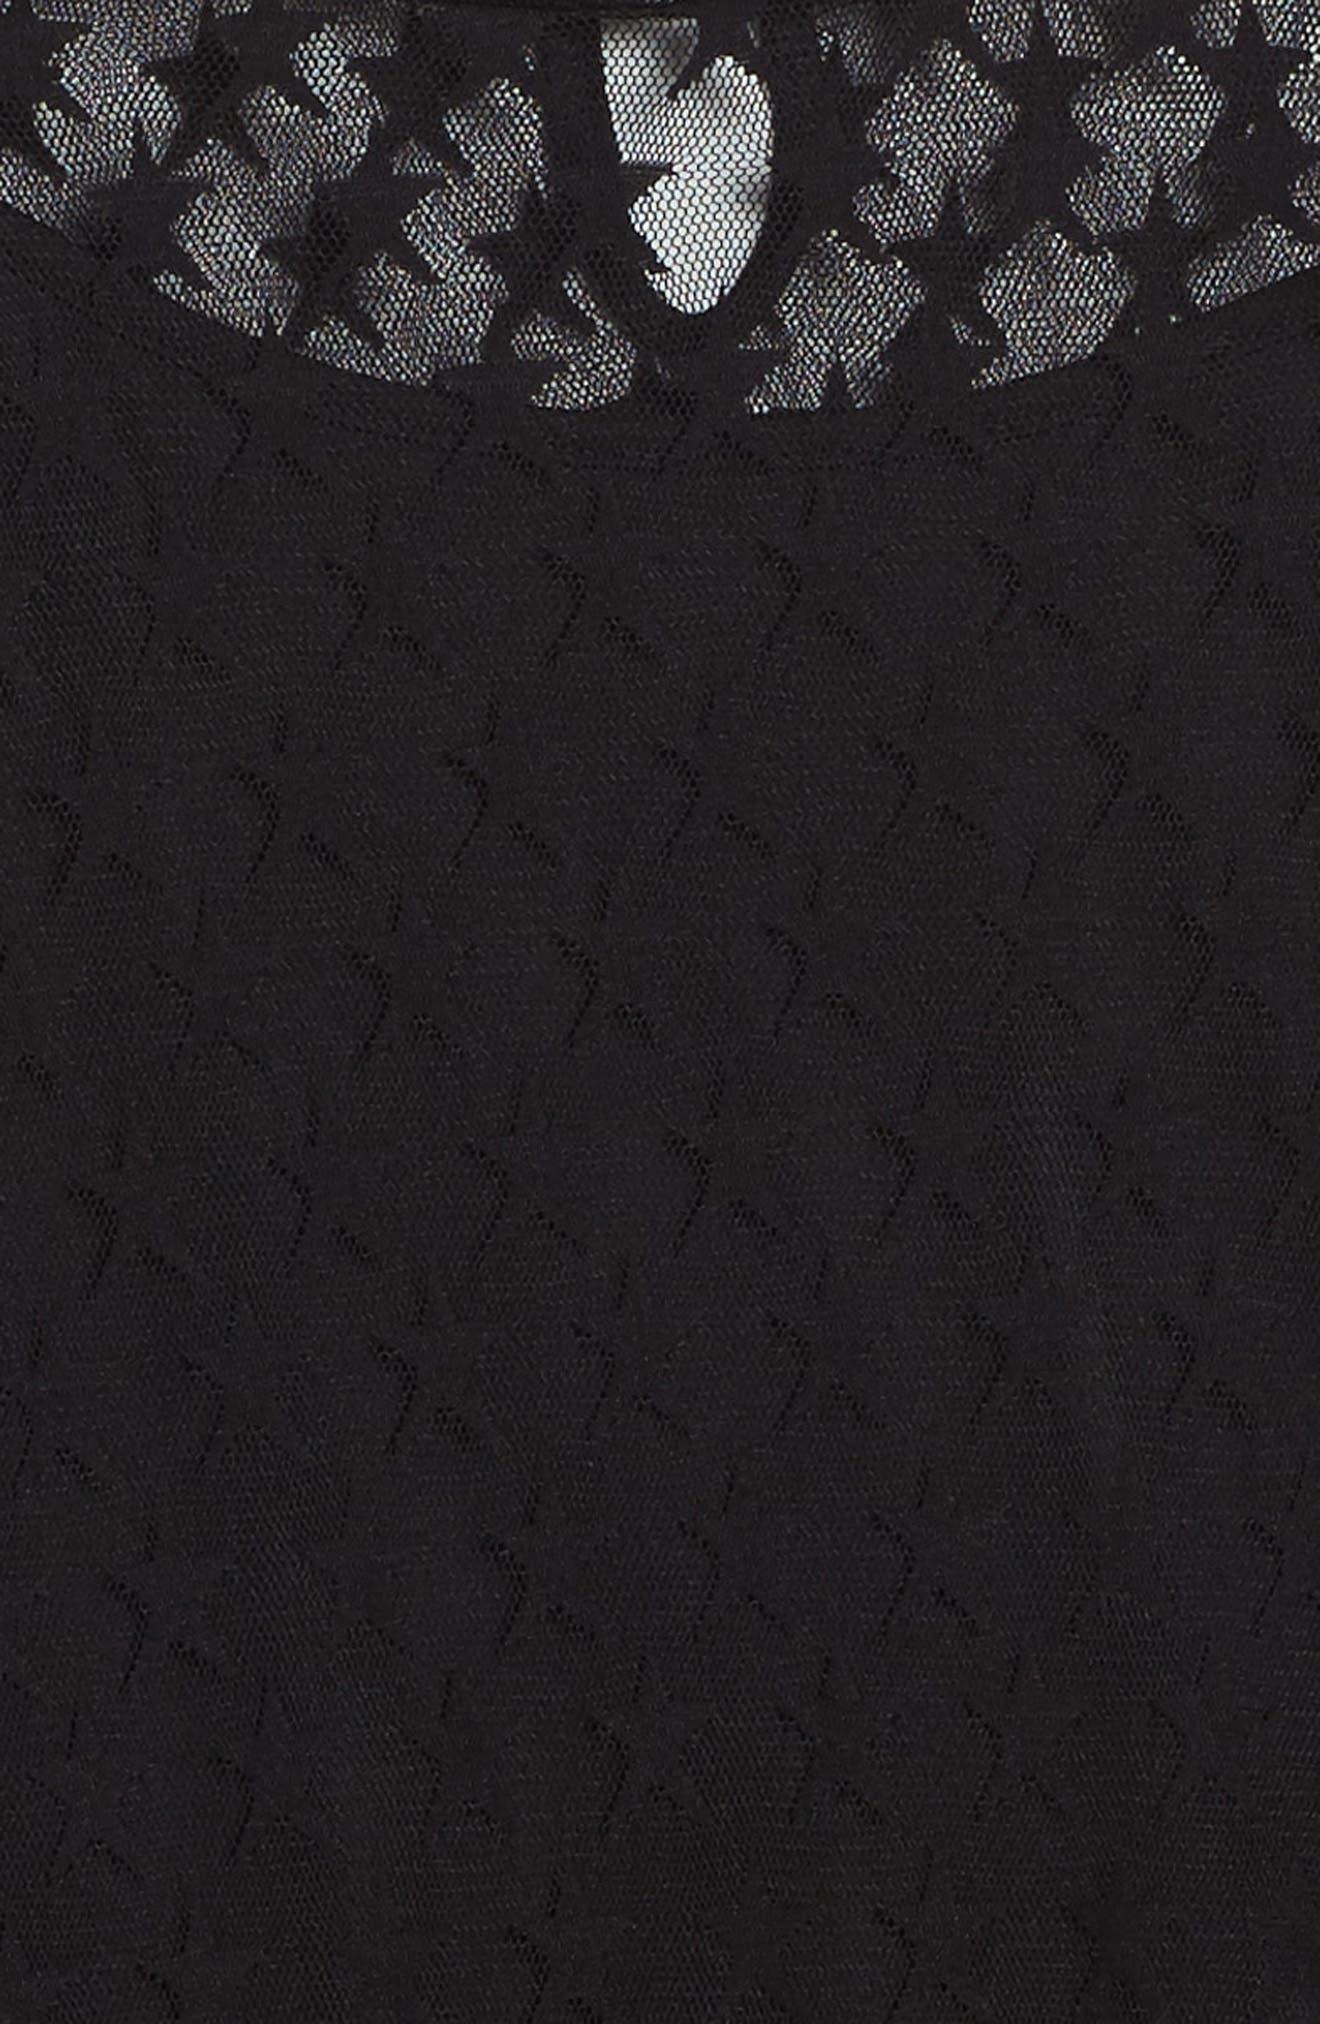 Star Mesh Dress,                             Alternate thumbnail 3, color,                             Black